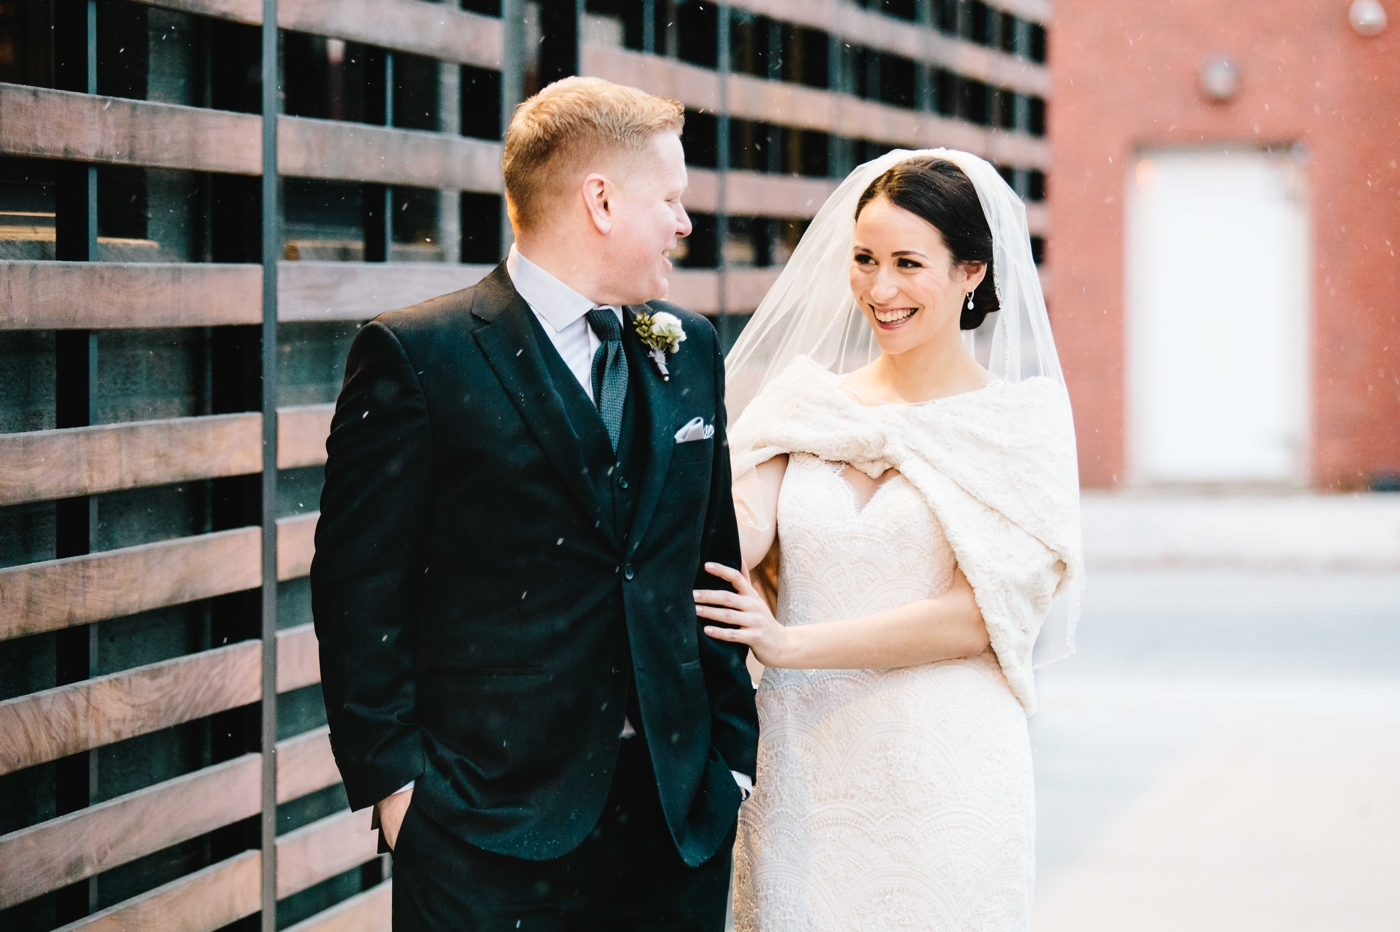 chicago-fine-art-wedding-photography-lintelman15